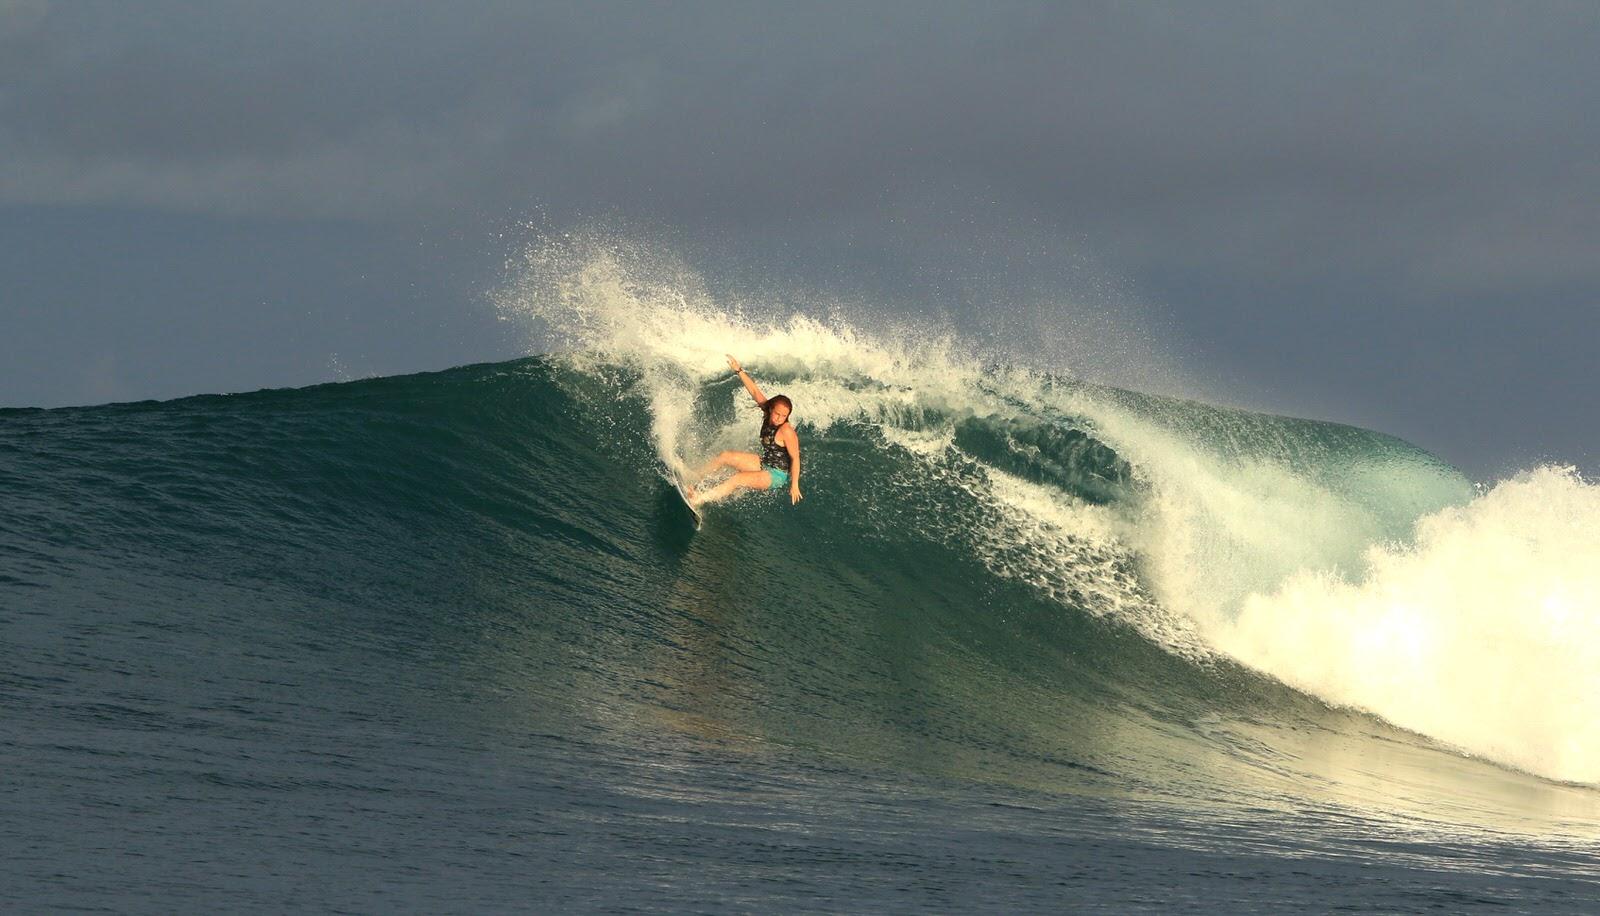 Grace Doyle Carving Billabong Team Rider. Female Pro Surfer.